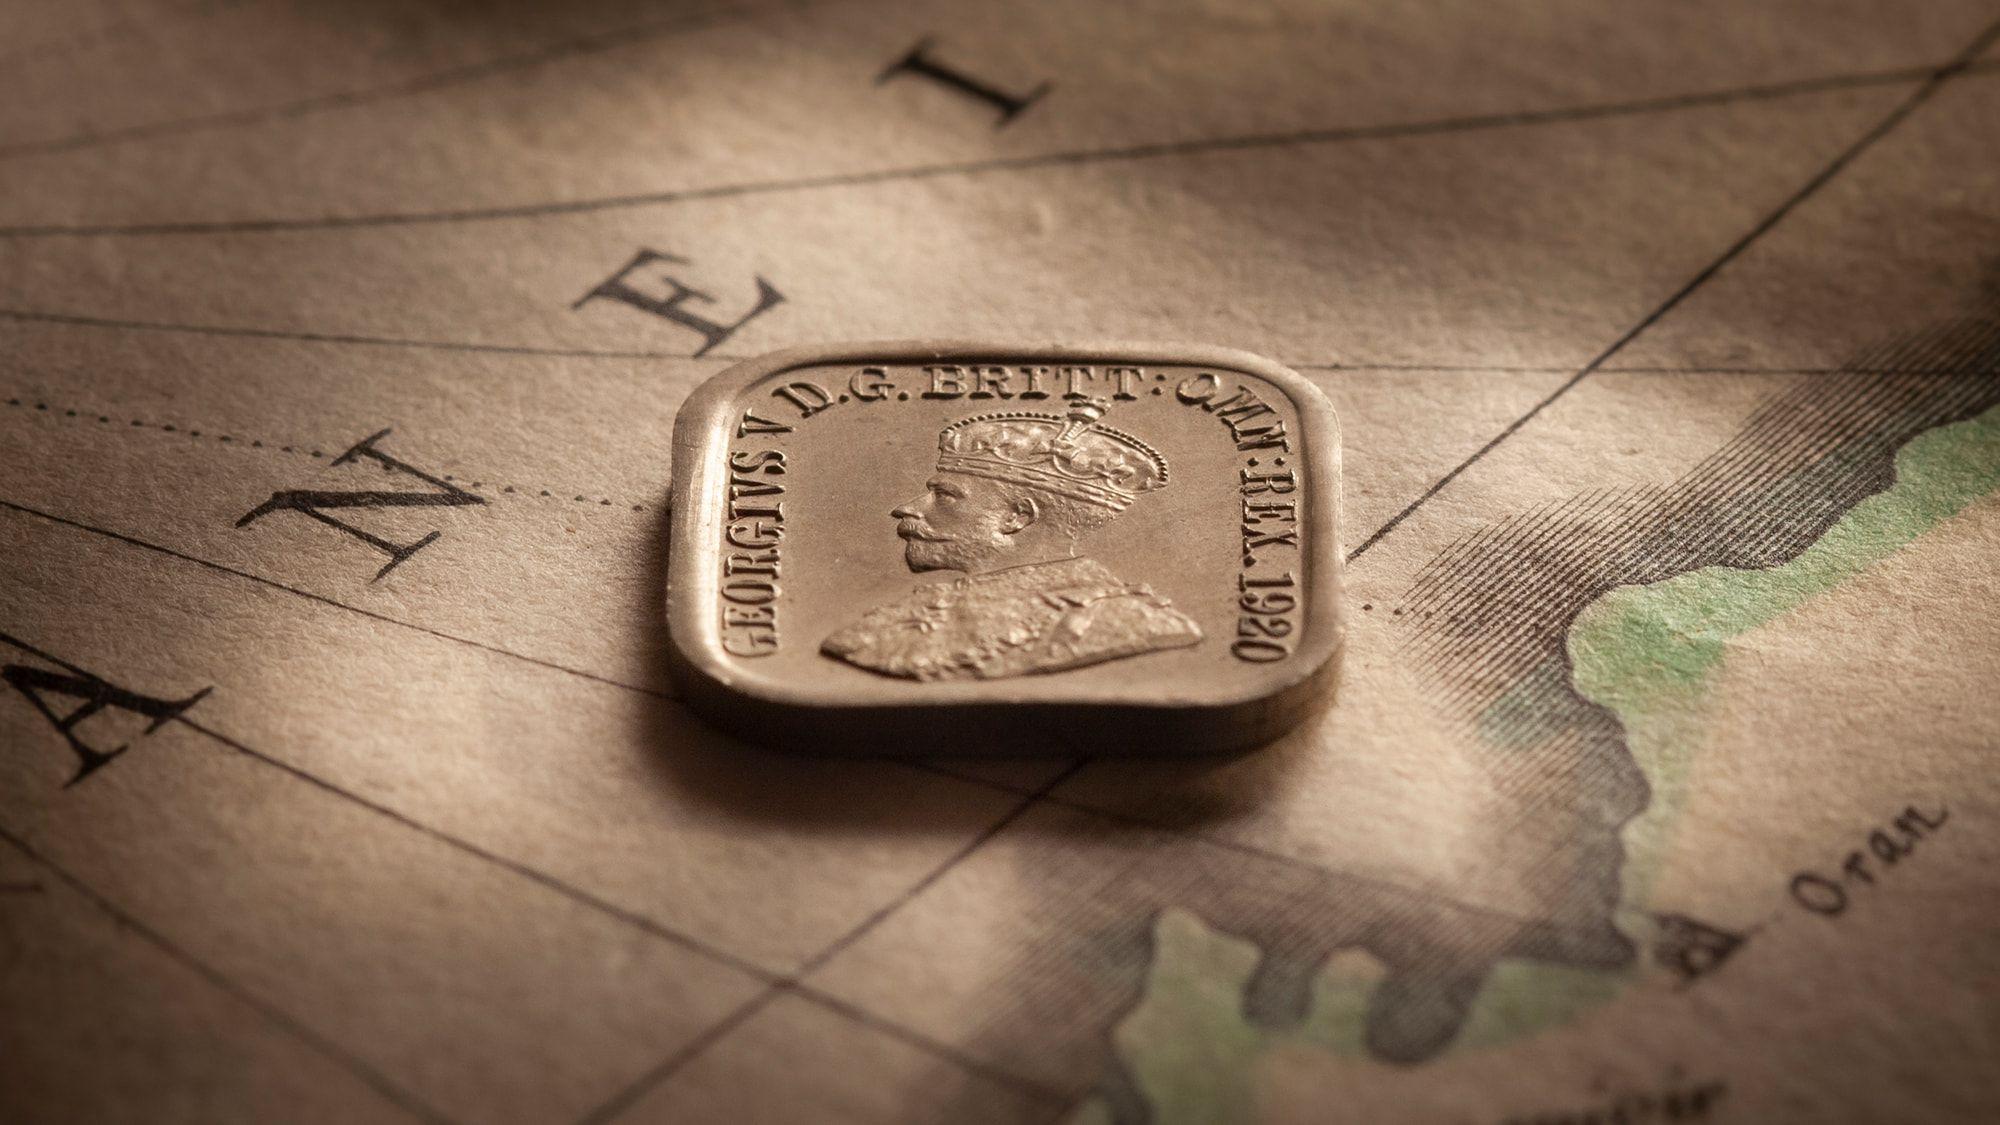 1920-Square-Kookaburra-Penny-2-T10-Obv-MOOD-41784-September-2021